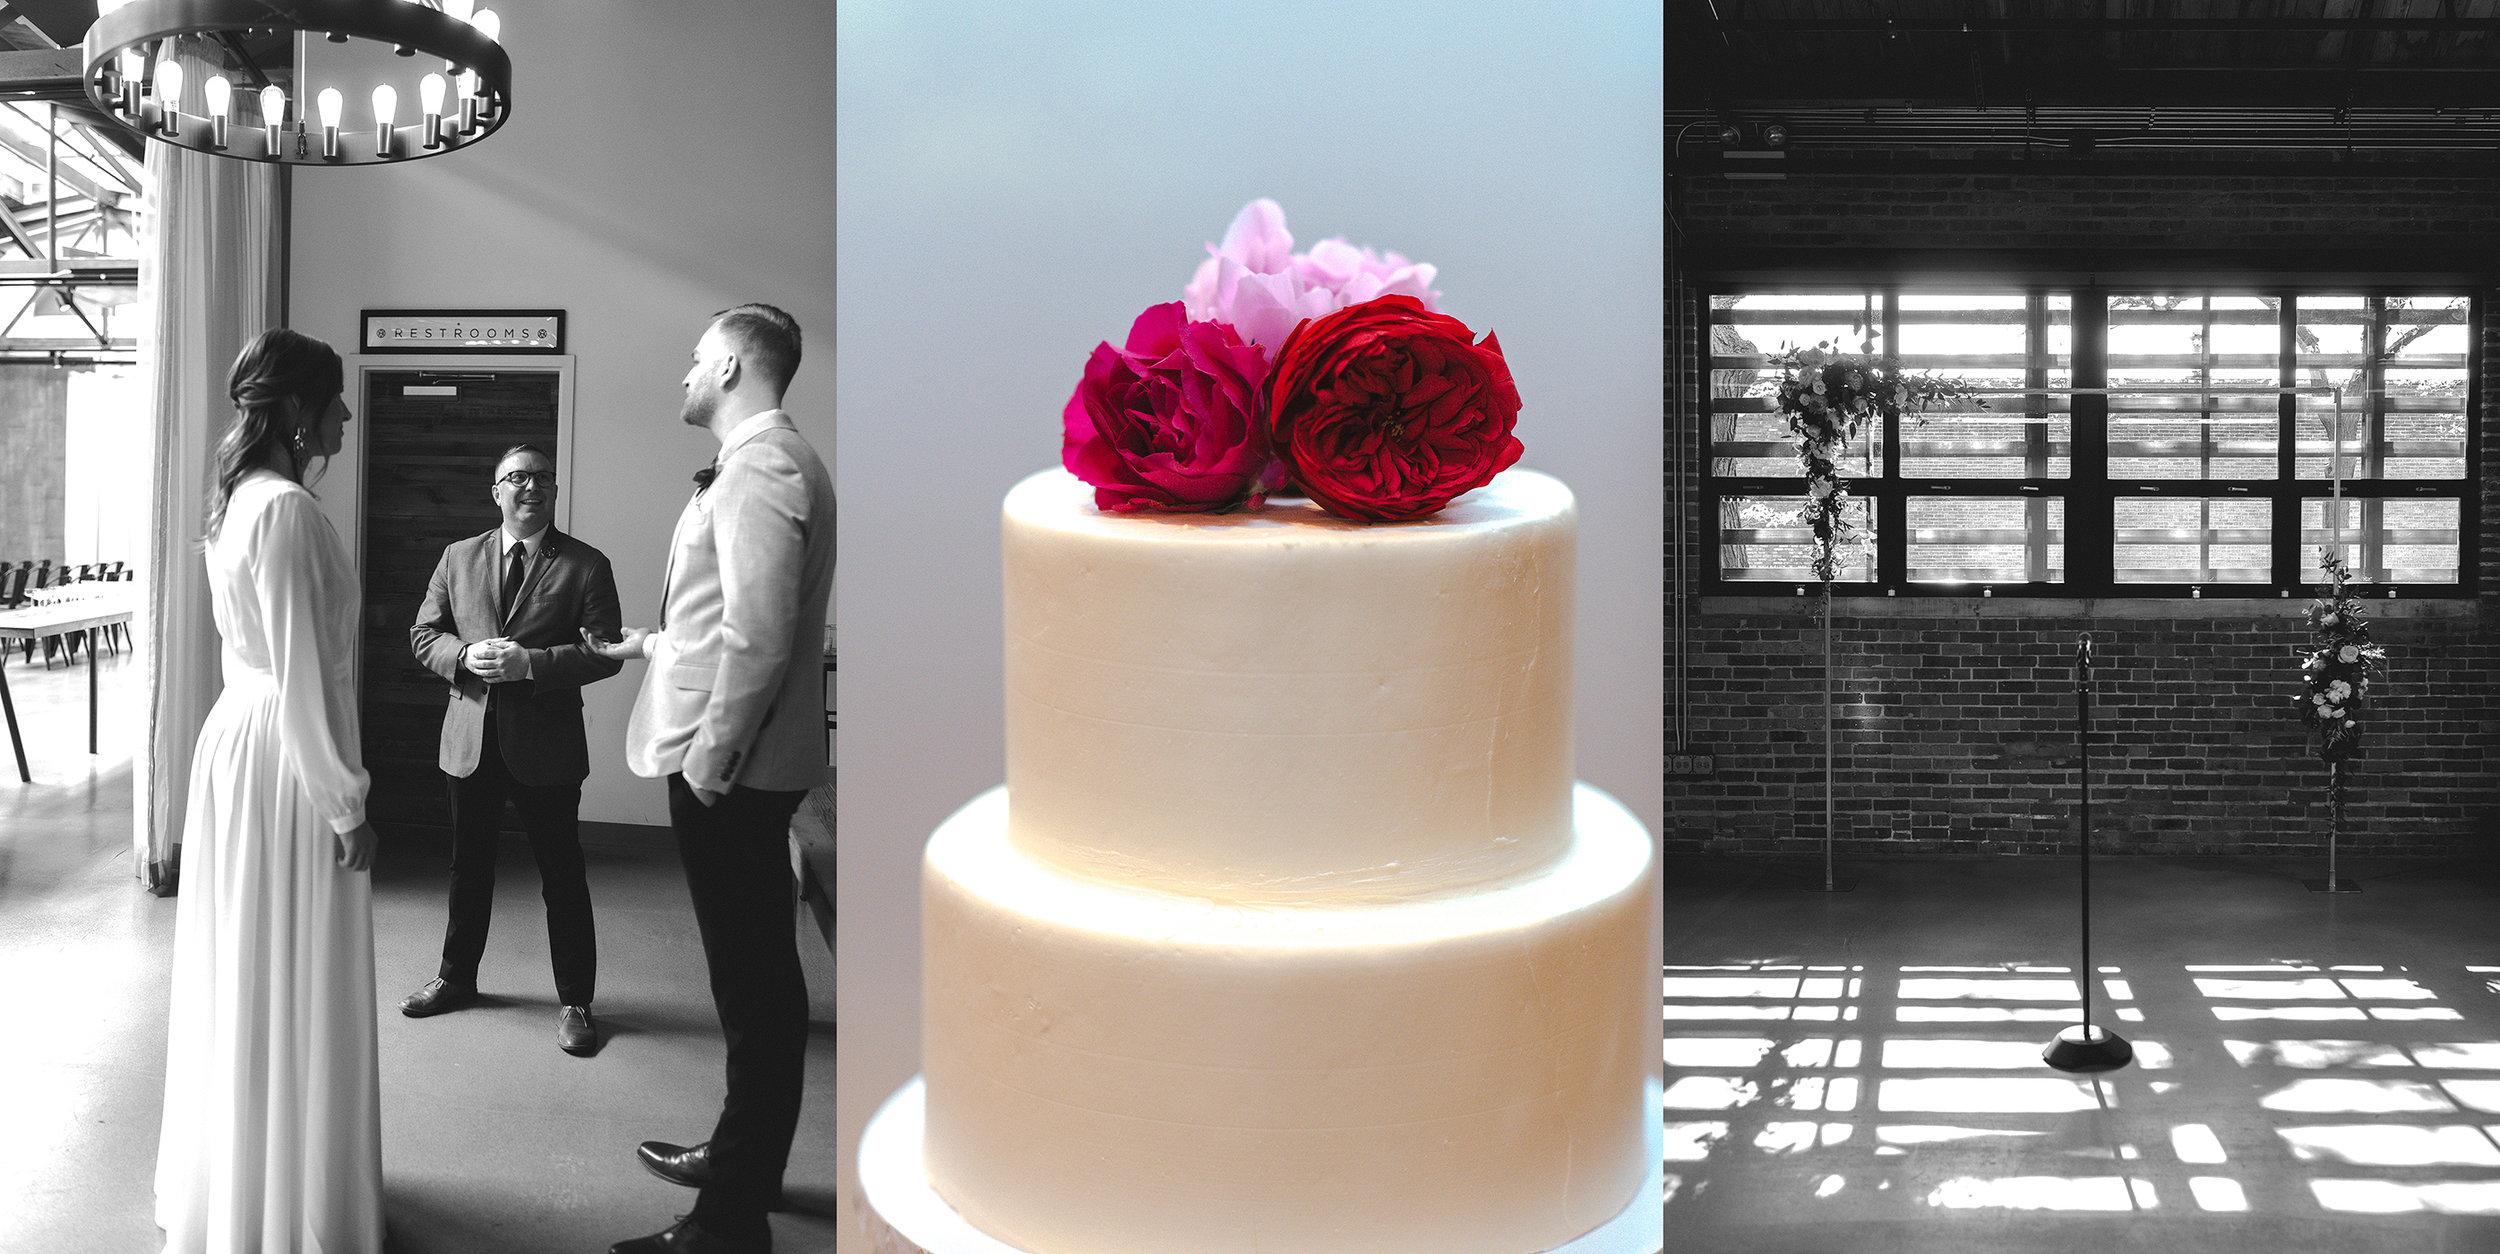 chicago_wedding_photography_zoe_rain_39.jpg